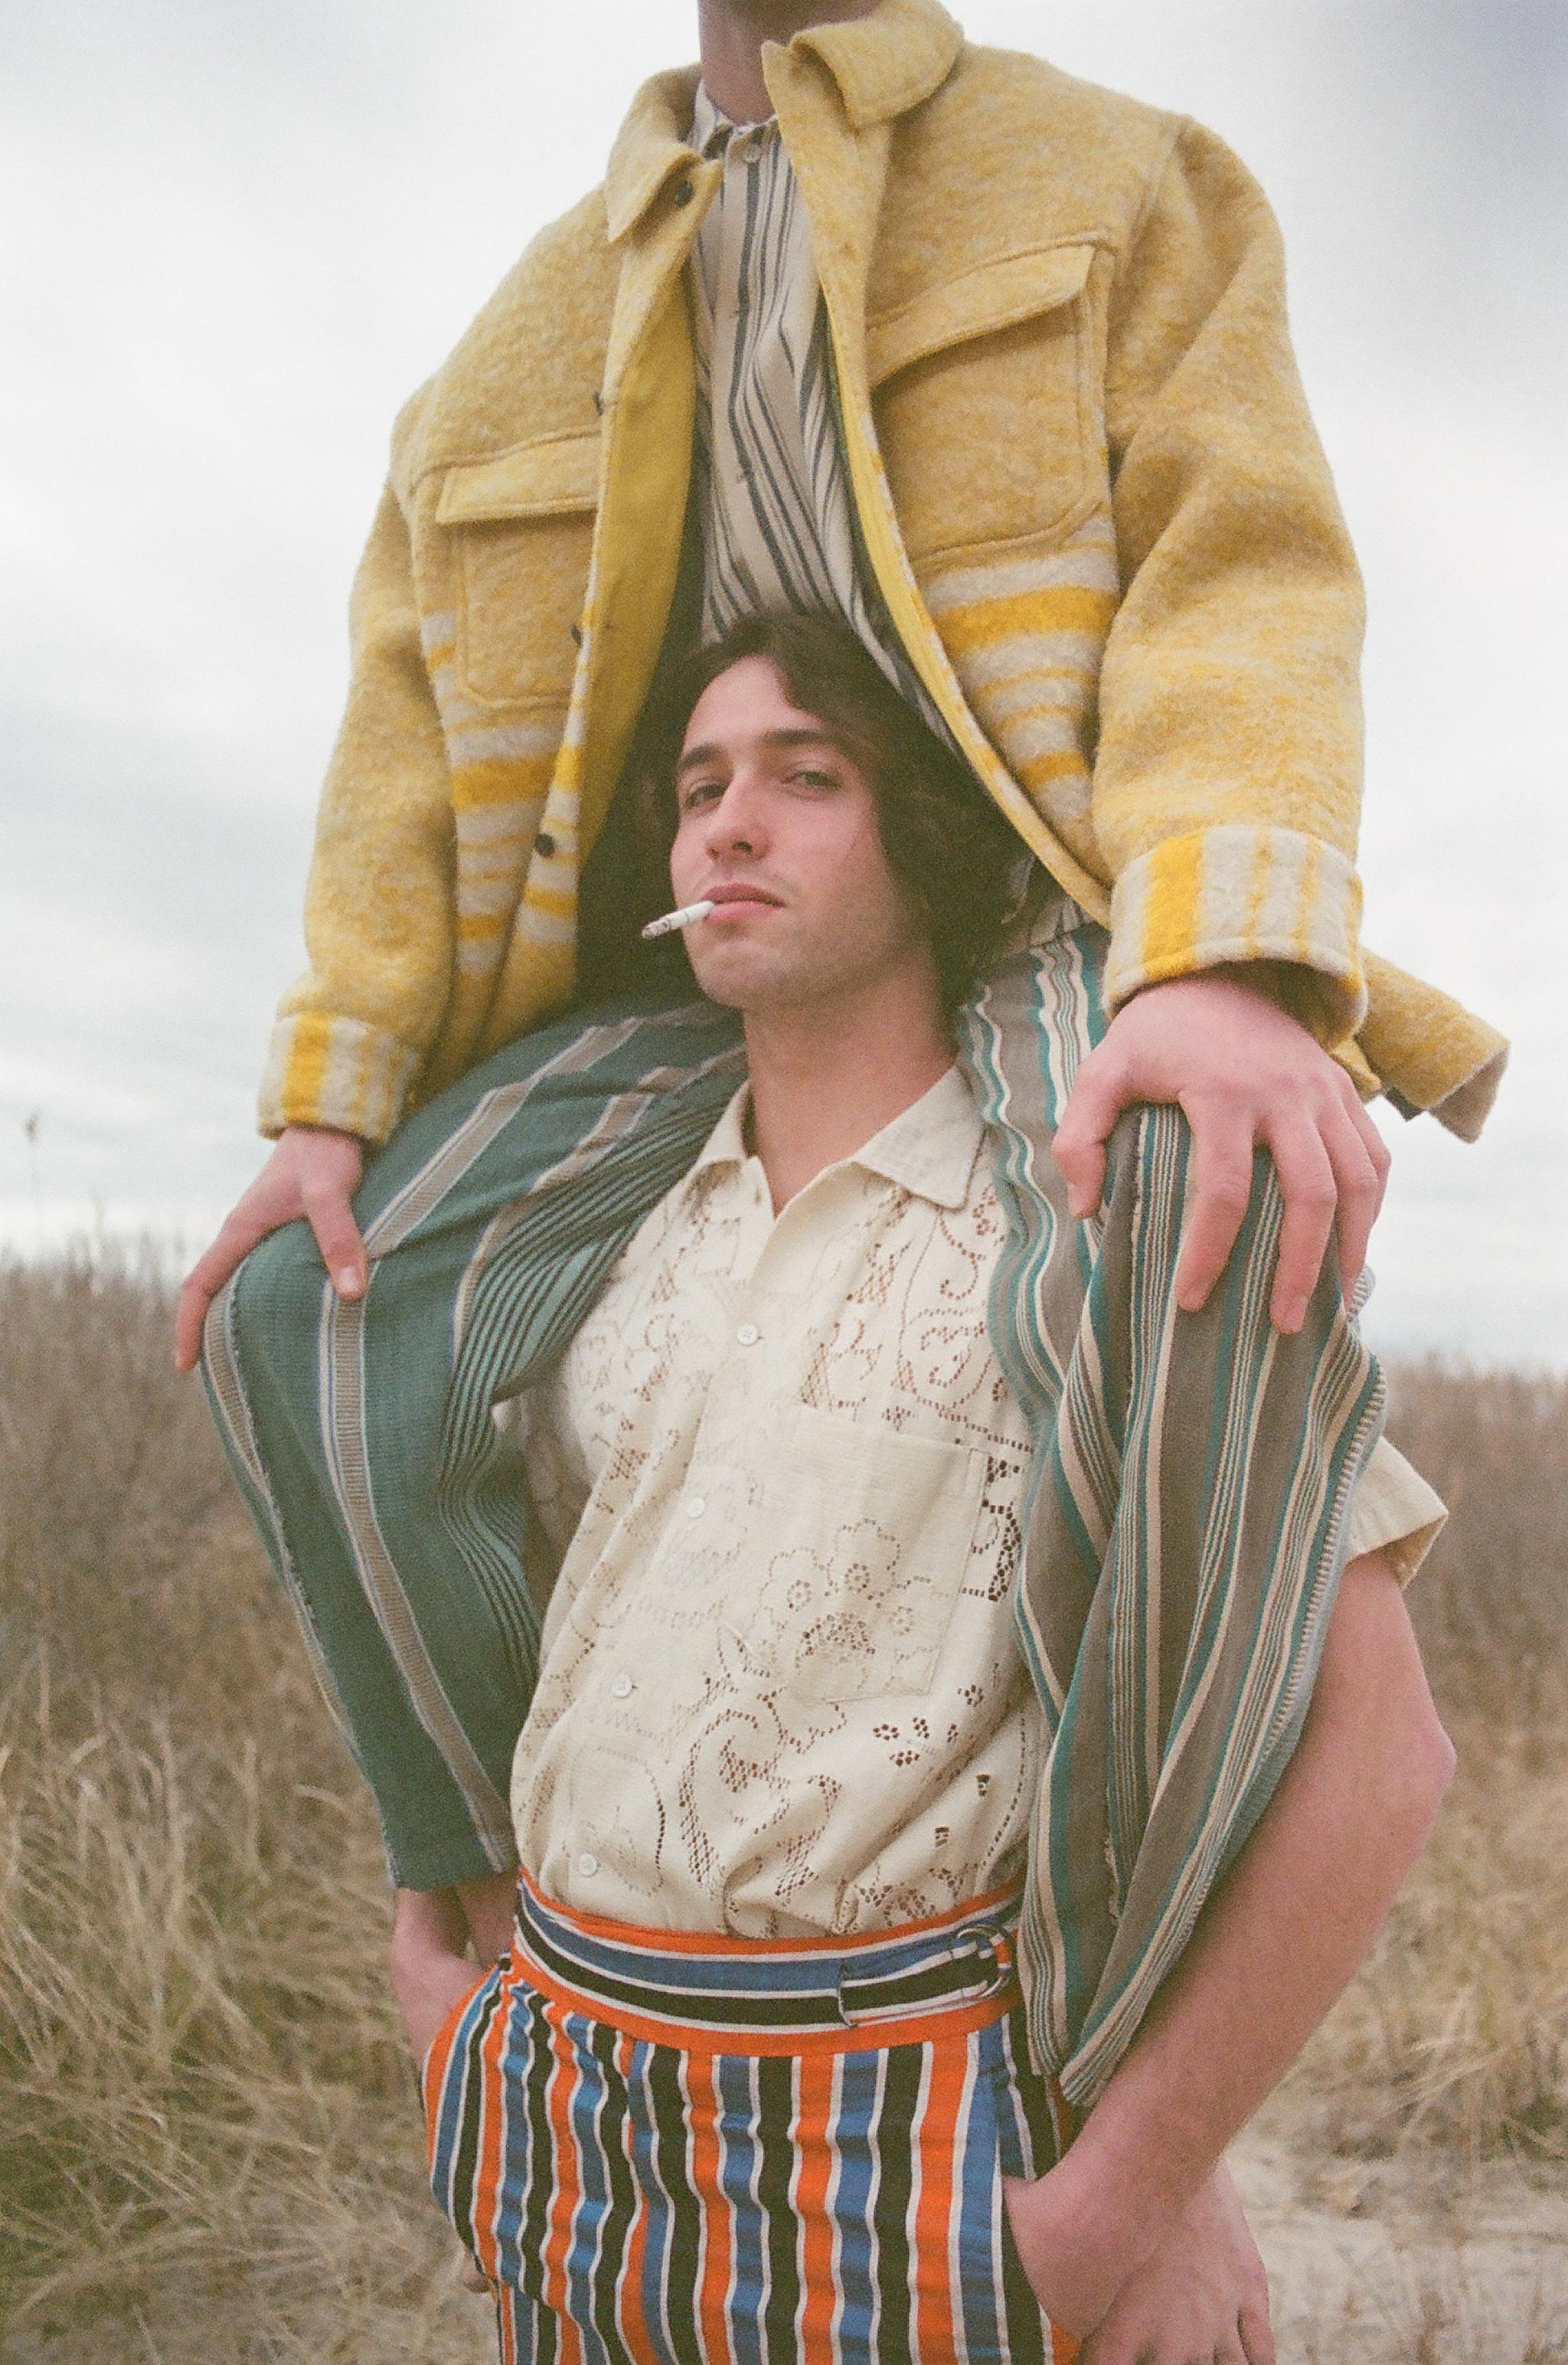 Chelsy-Mitchel-photographer-bode-nyc-fashion-beach-editorial-beachside-car-christian-matthew-rice-styling.jpg